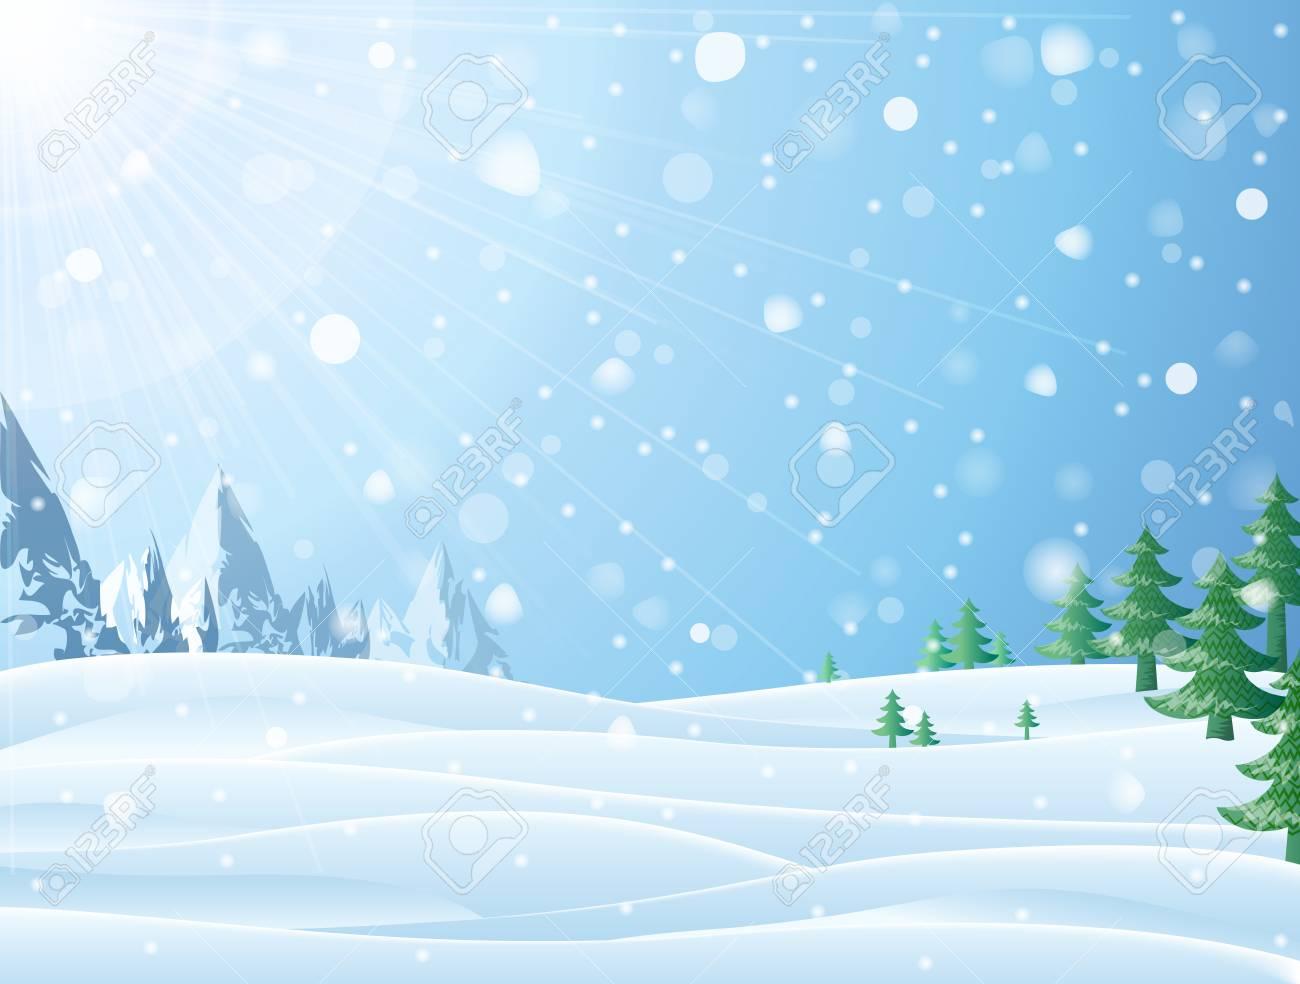 Daytime Snowy Scene With Ridge And Christmas Trees Snowfall